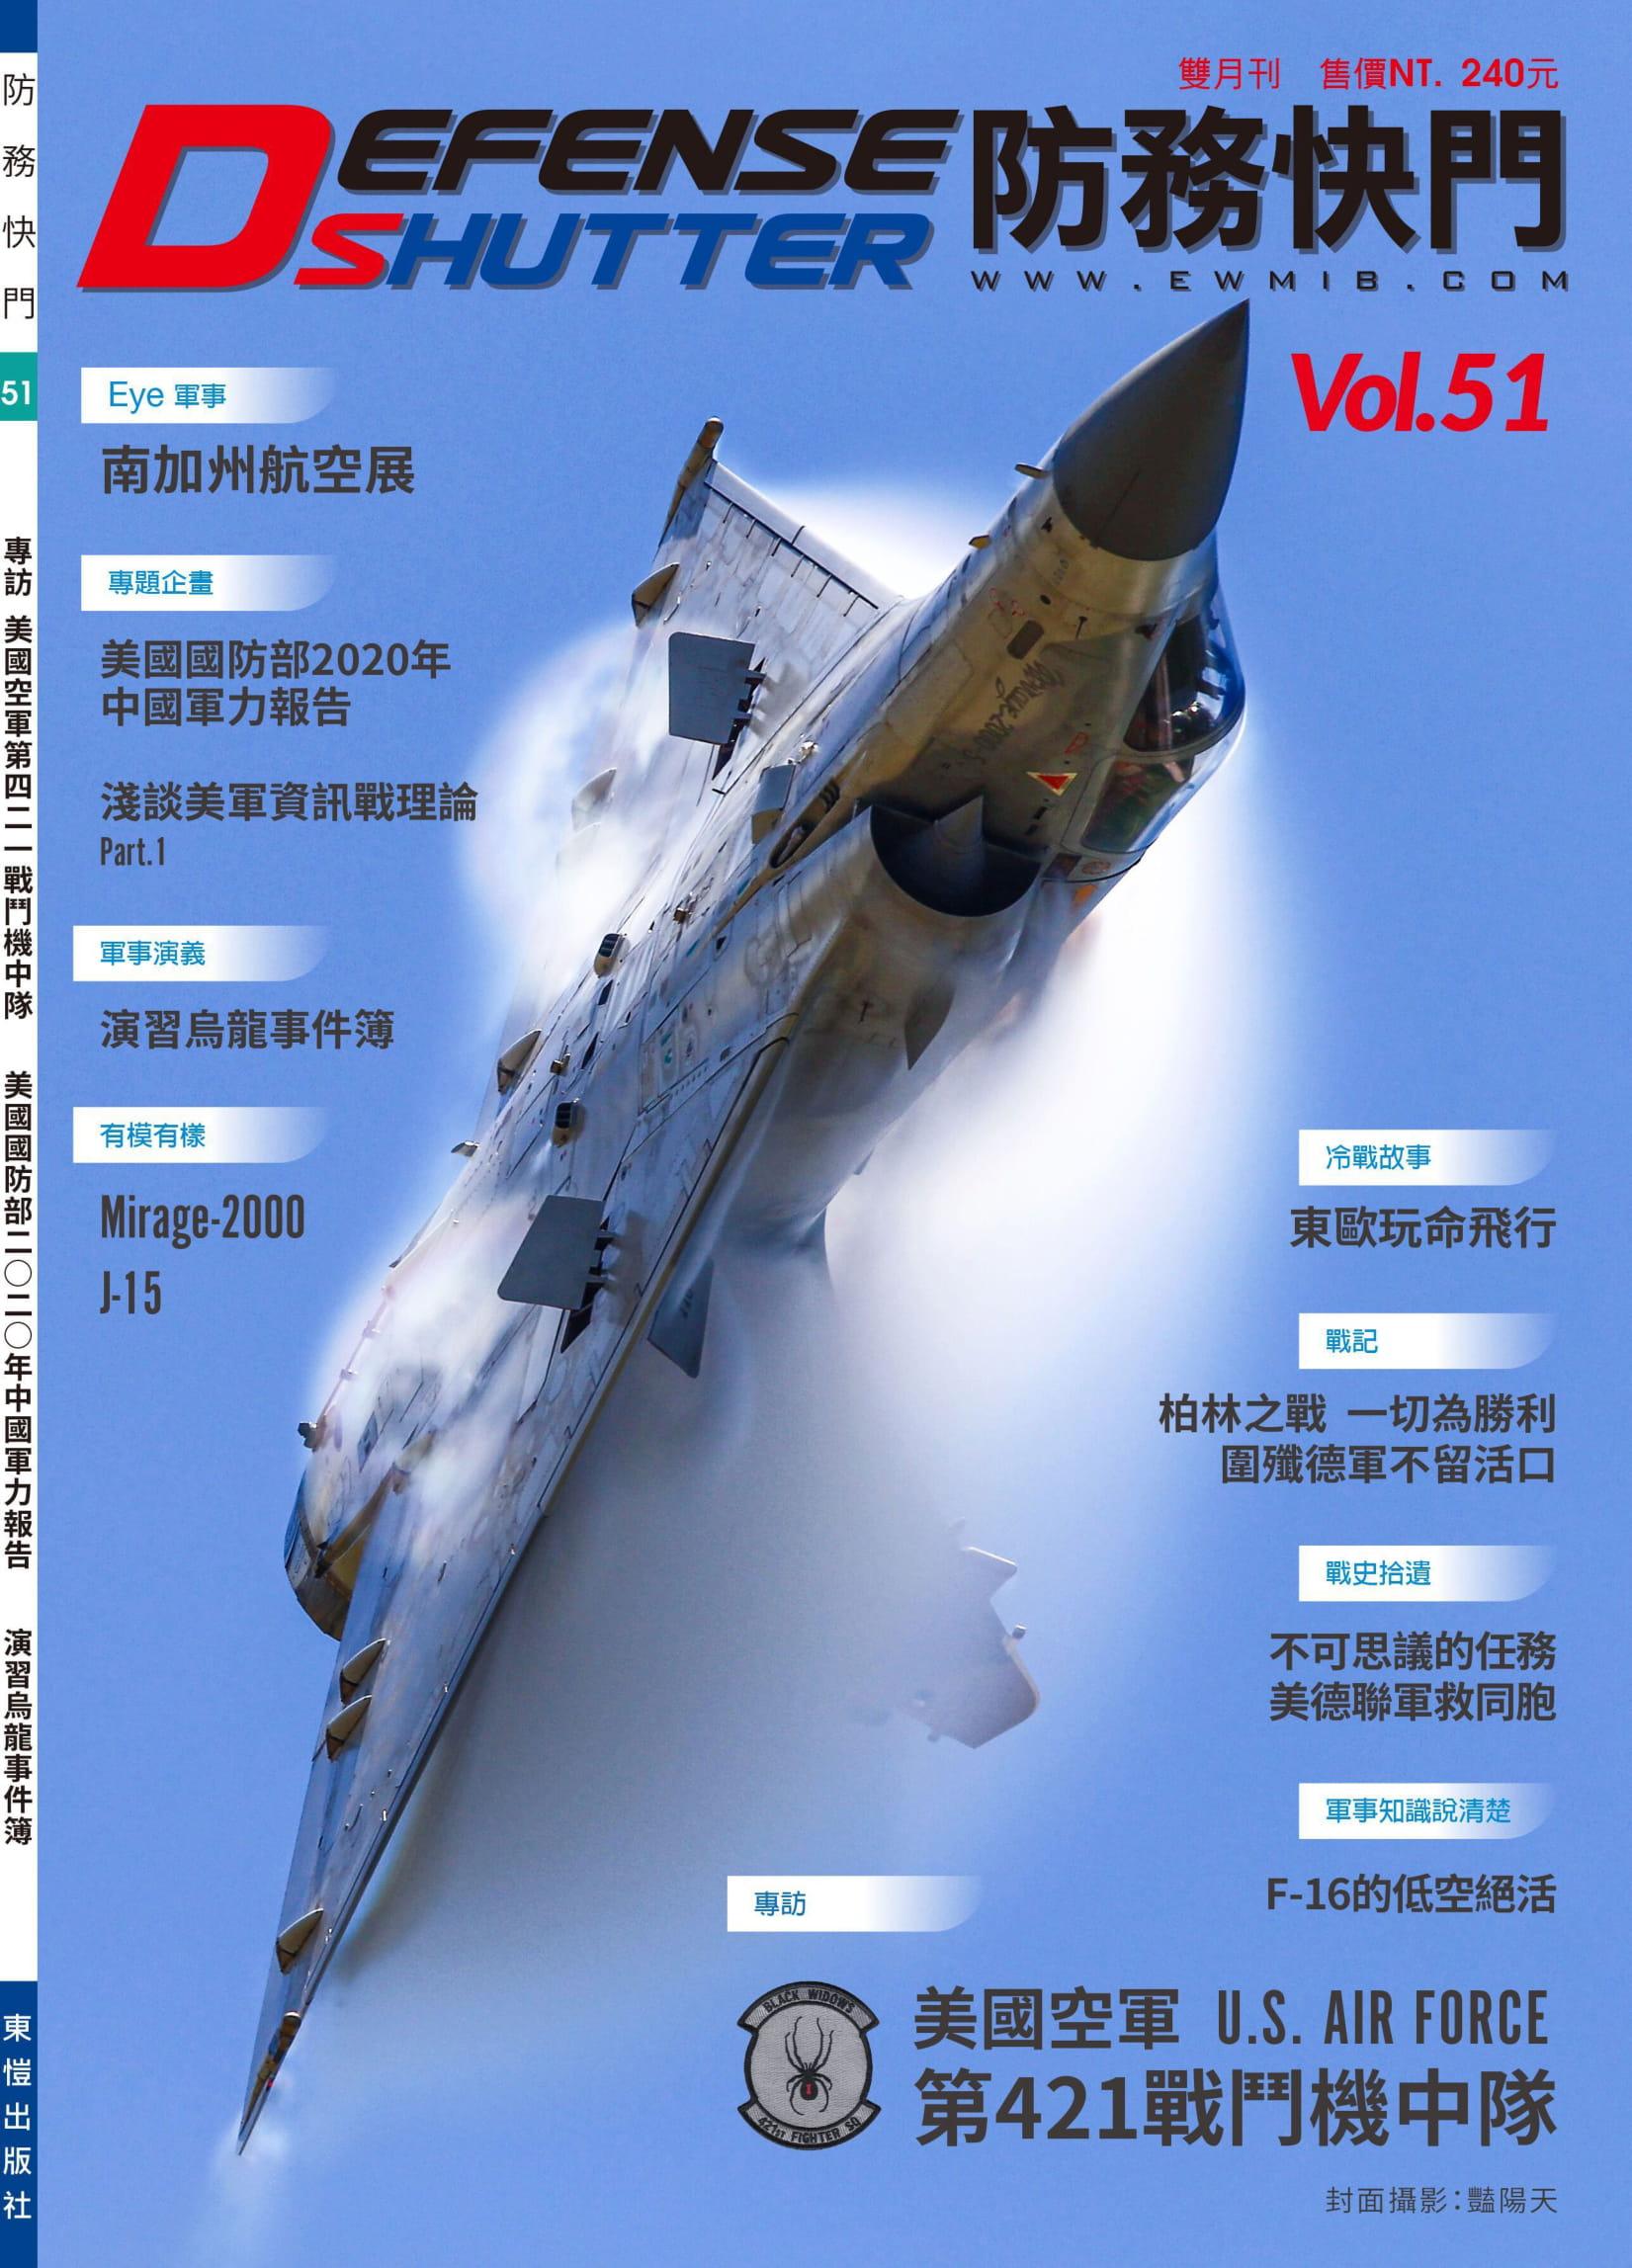 Defense Shutter (Taiwan)_F-35s at Spangdahlem Air Base-1